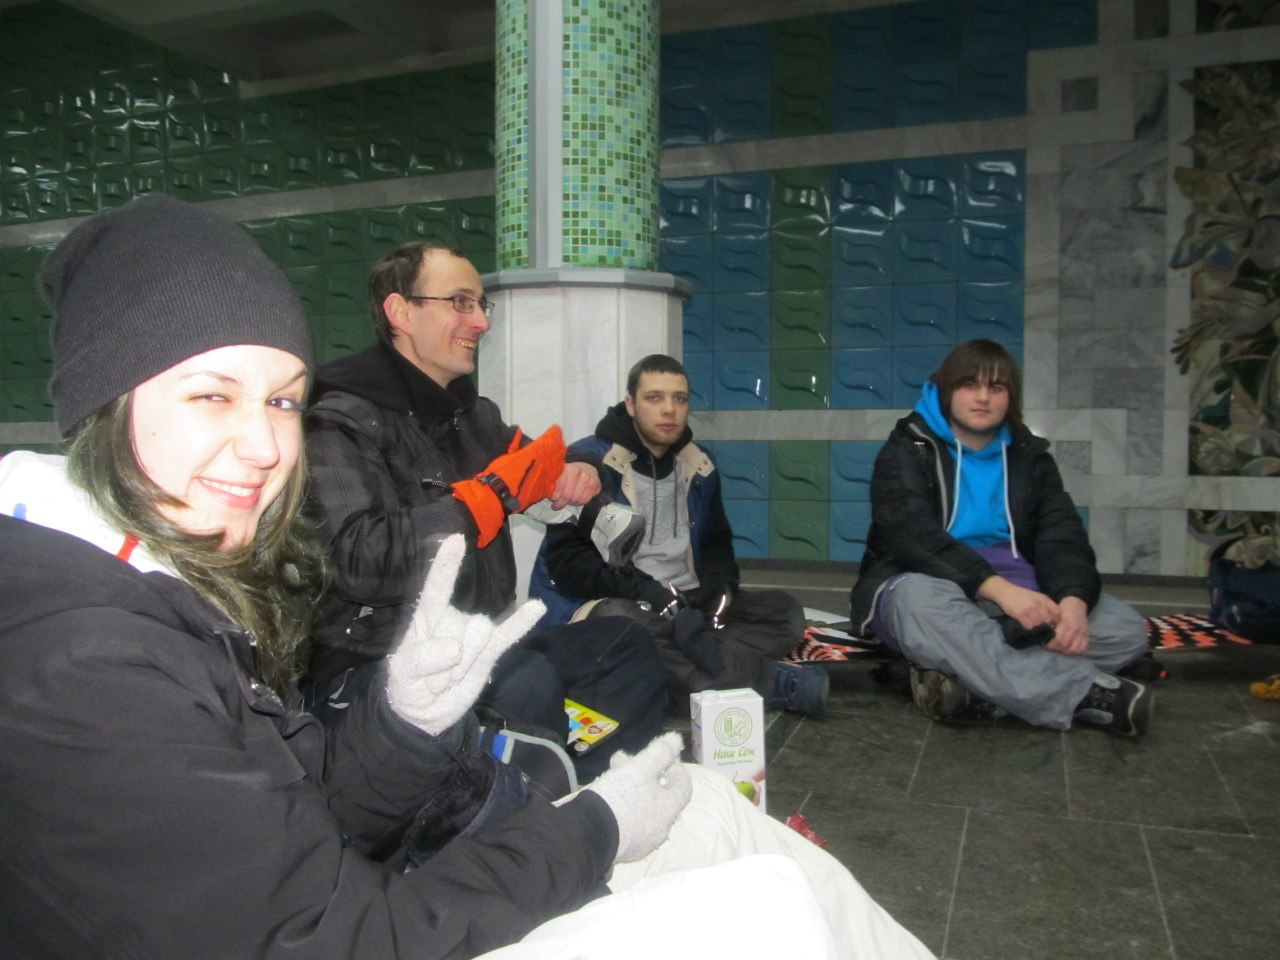 Ужин в метро - день трезвости, сок и пряики